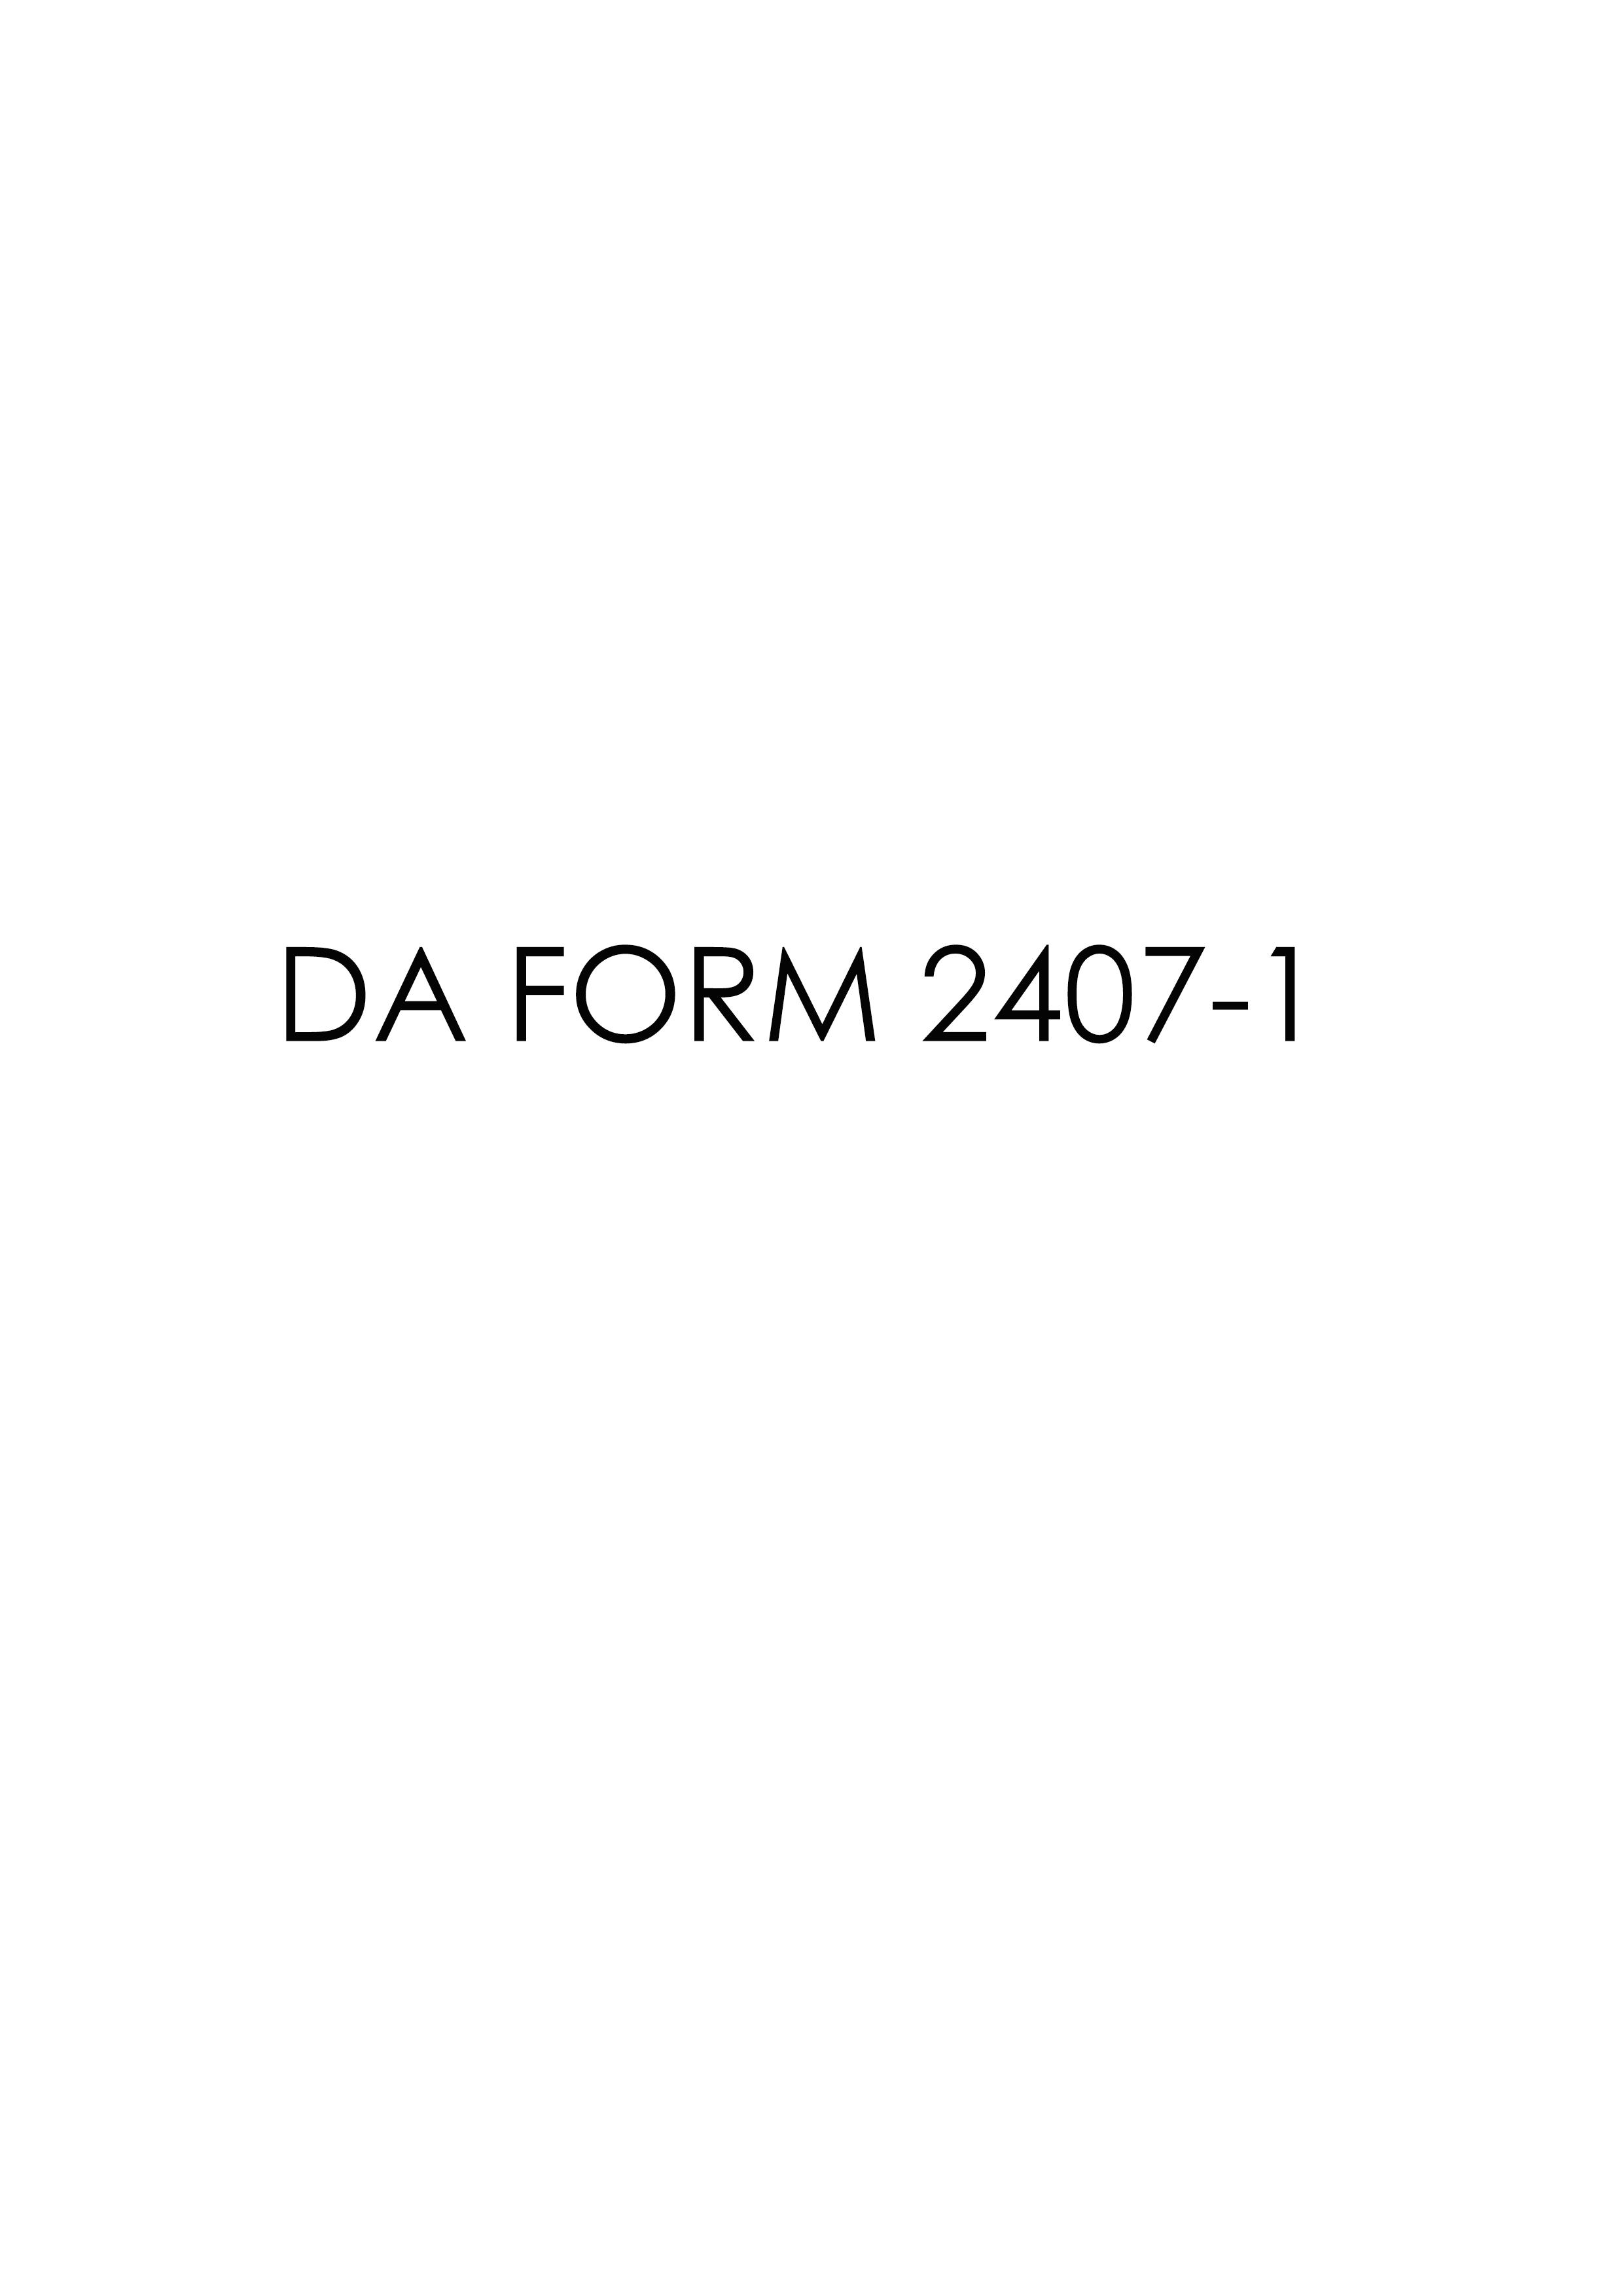 Download da Form 2407-1 Free